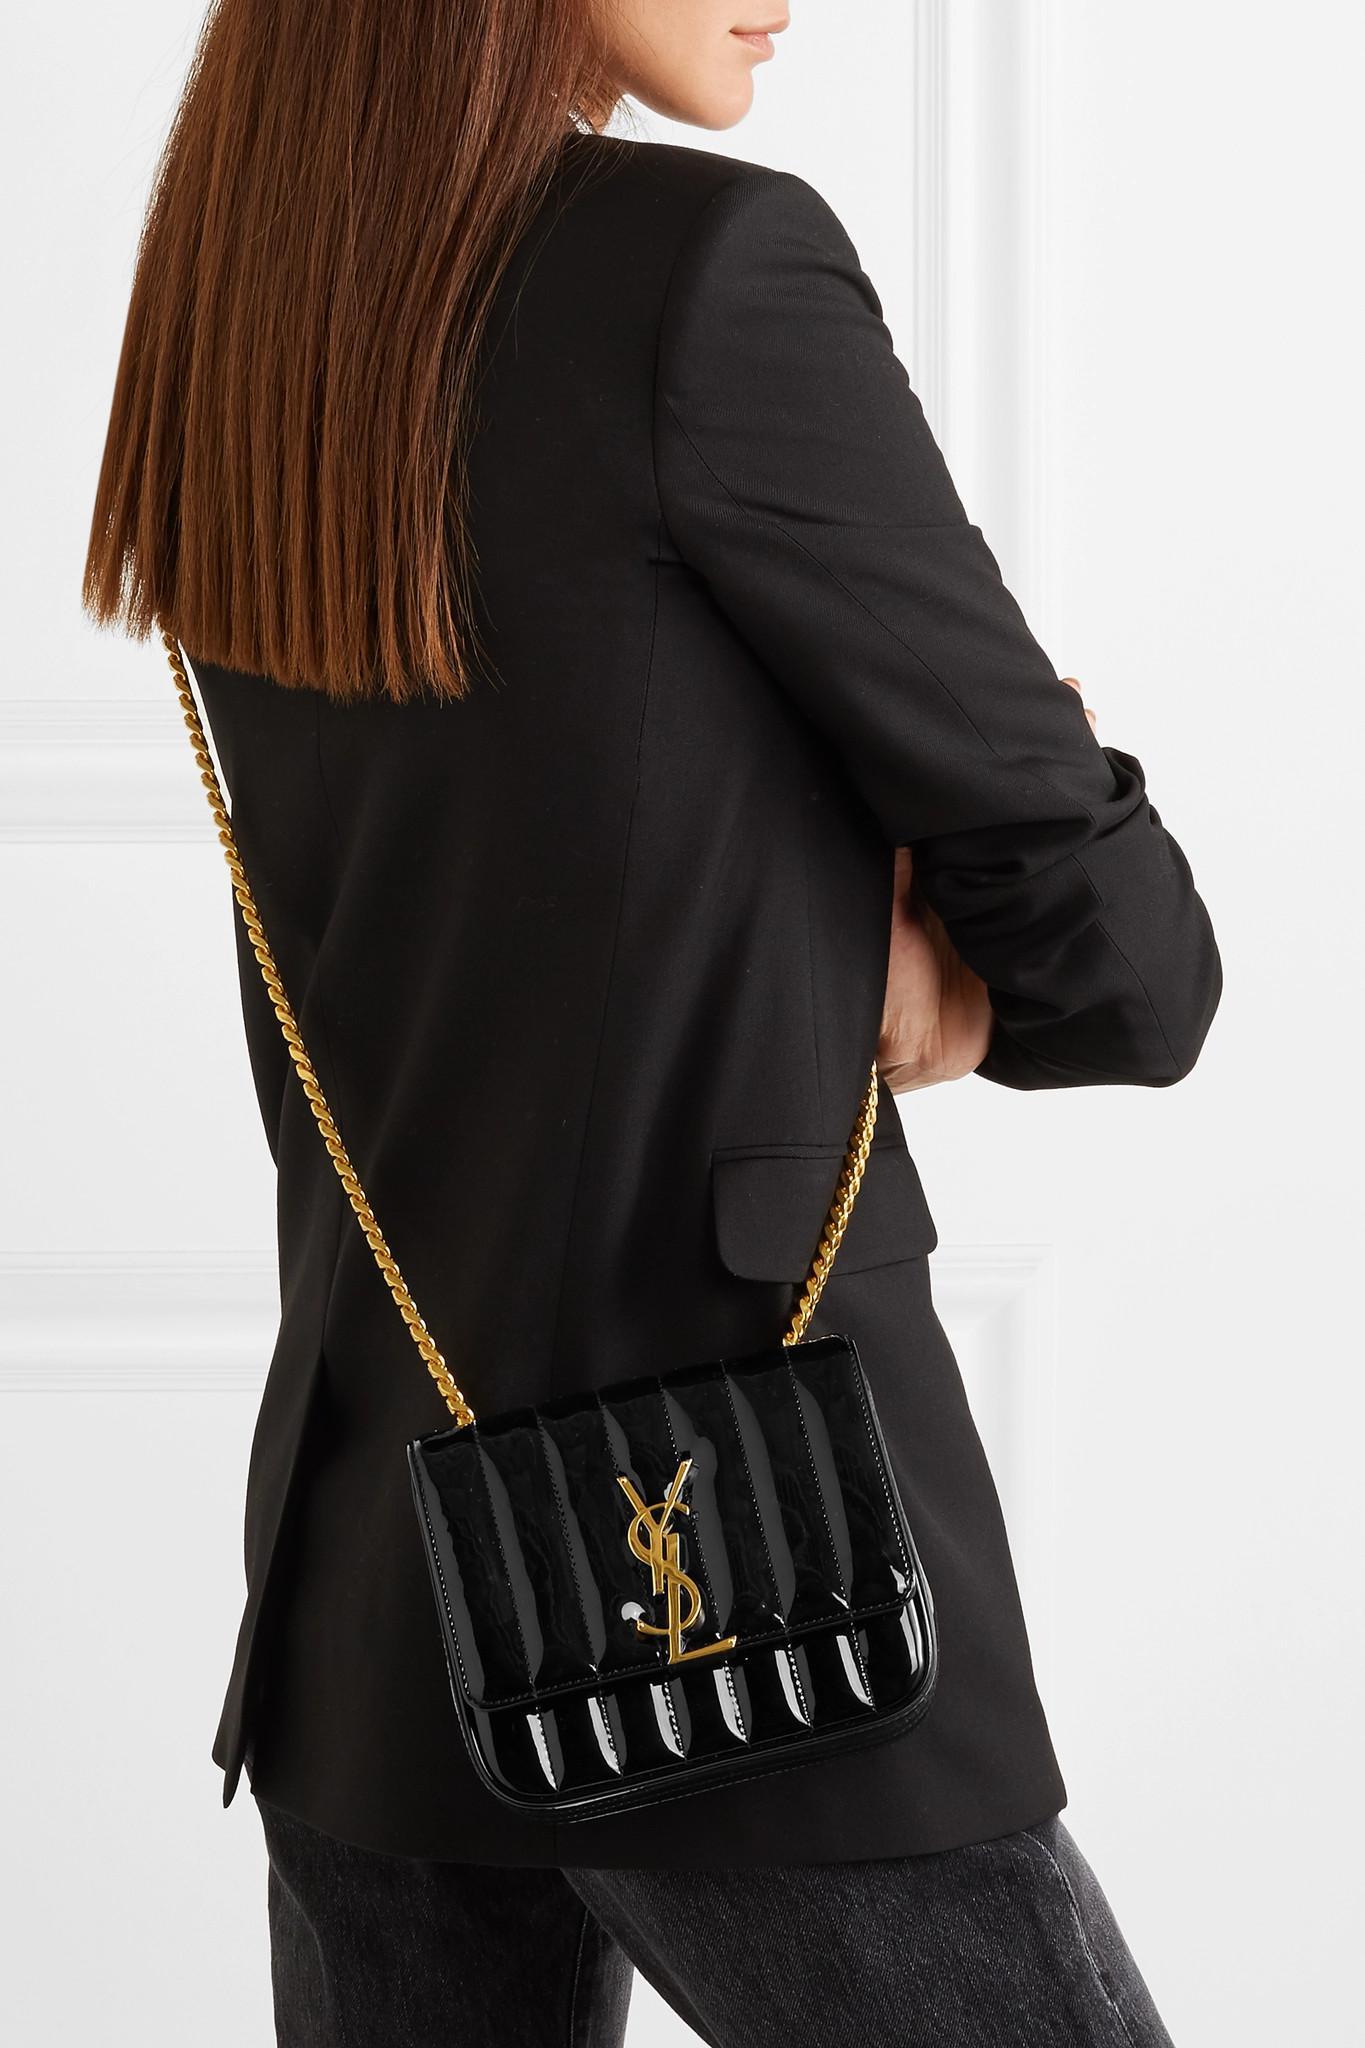 904f06b9cd7 Saint Laurent - Black Monogram Vicky Medium Leather Chain Bag - Lyst. View  fullscreen